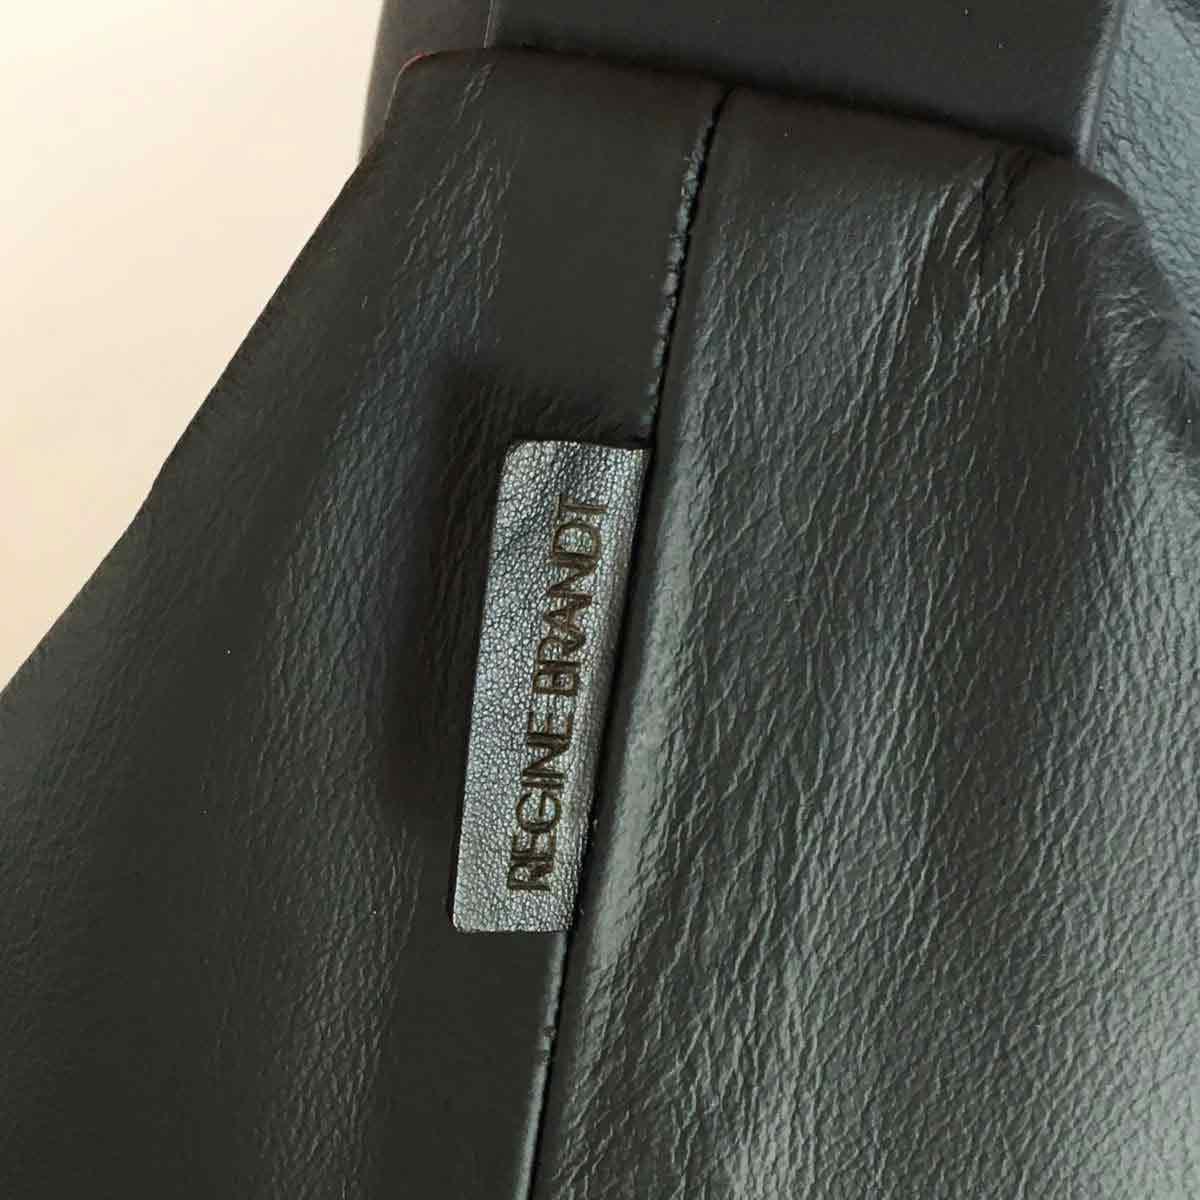 Lasergravuren auf Leder